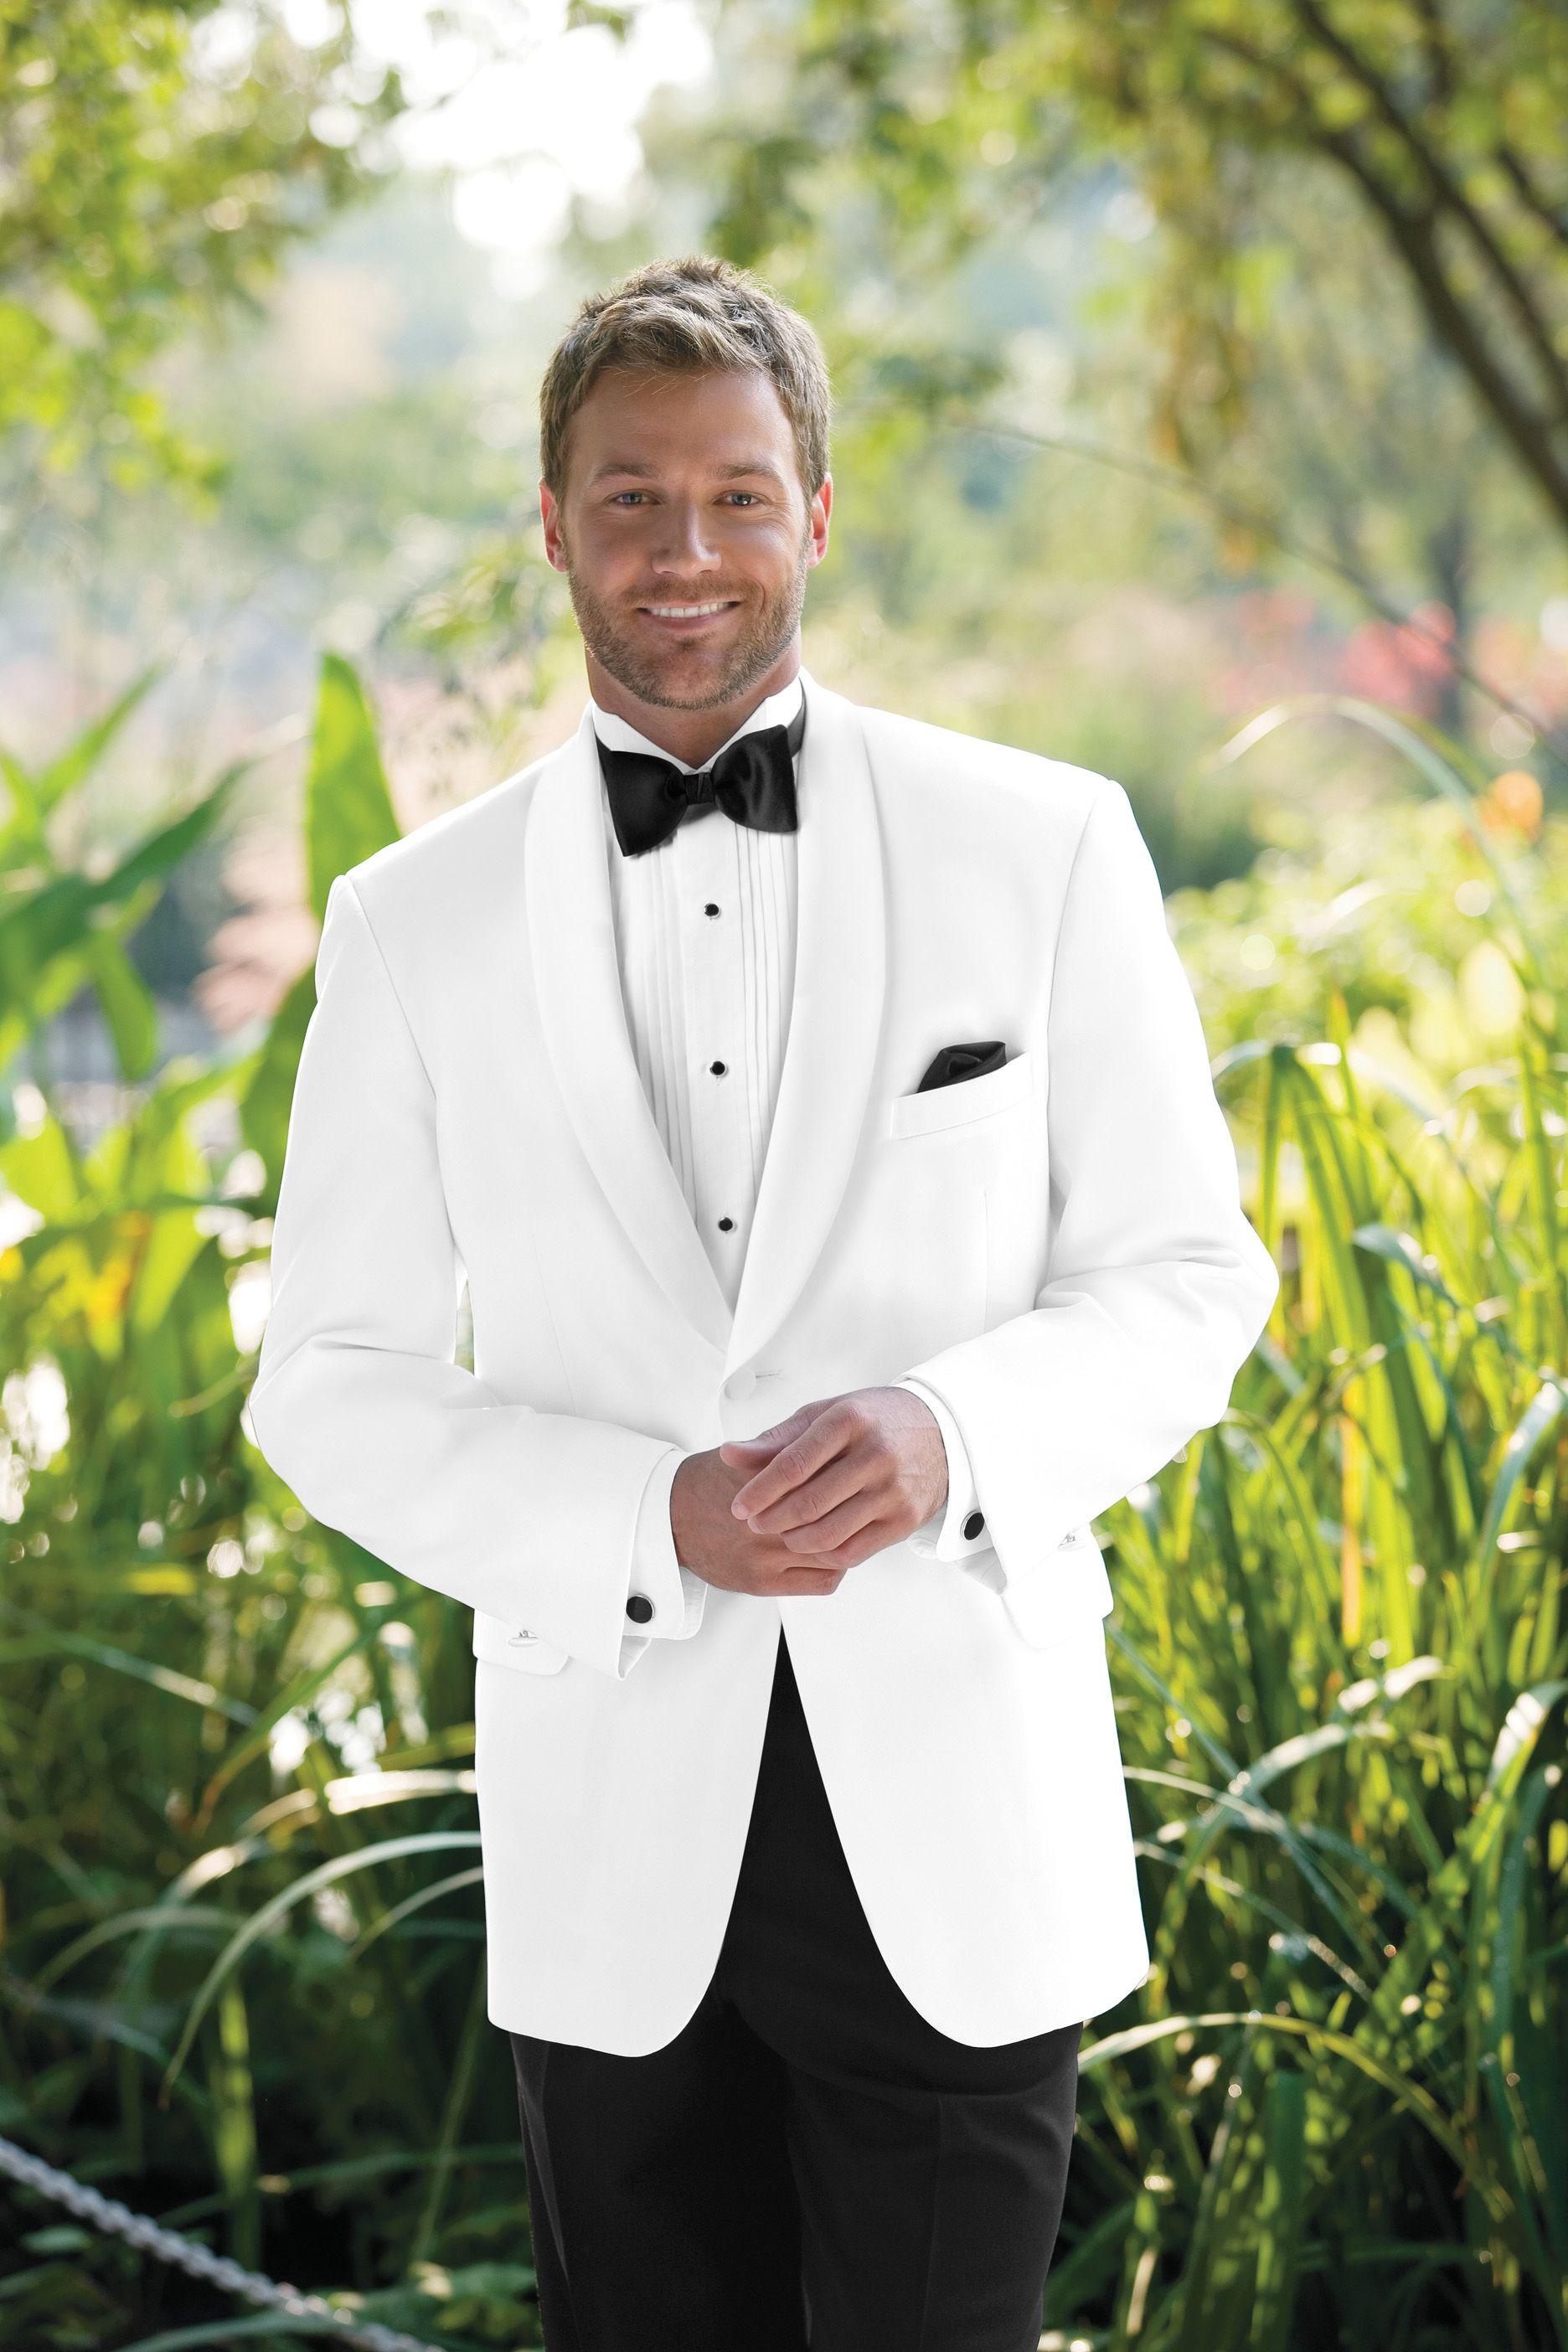 White Shawl Collar Dinner Jacket, and Black Tuxedo Pants